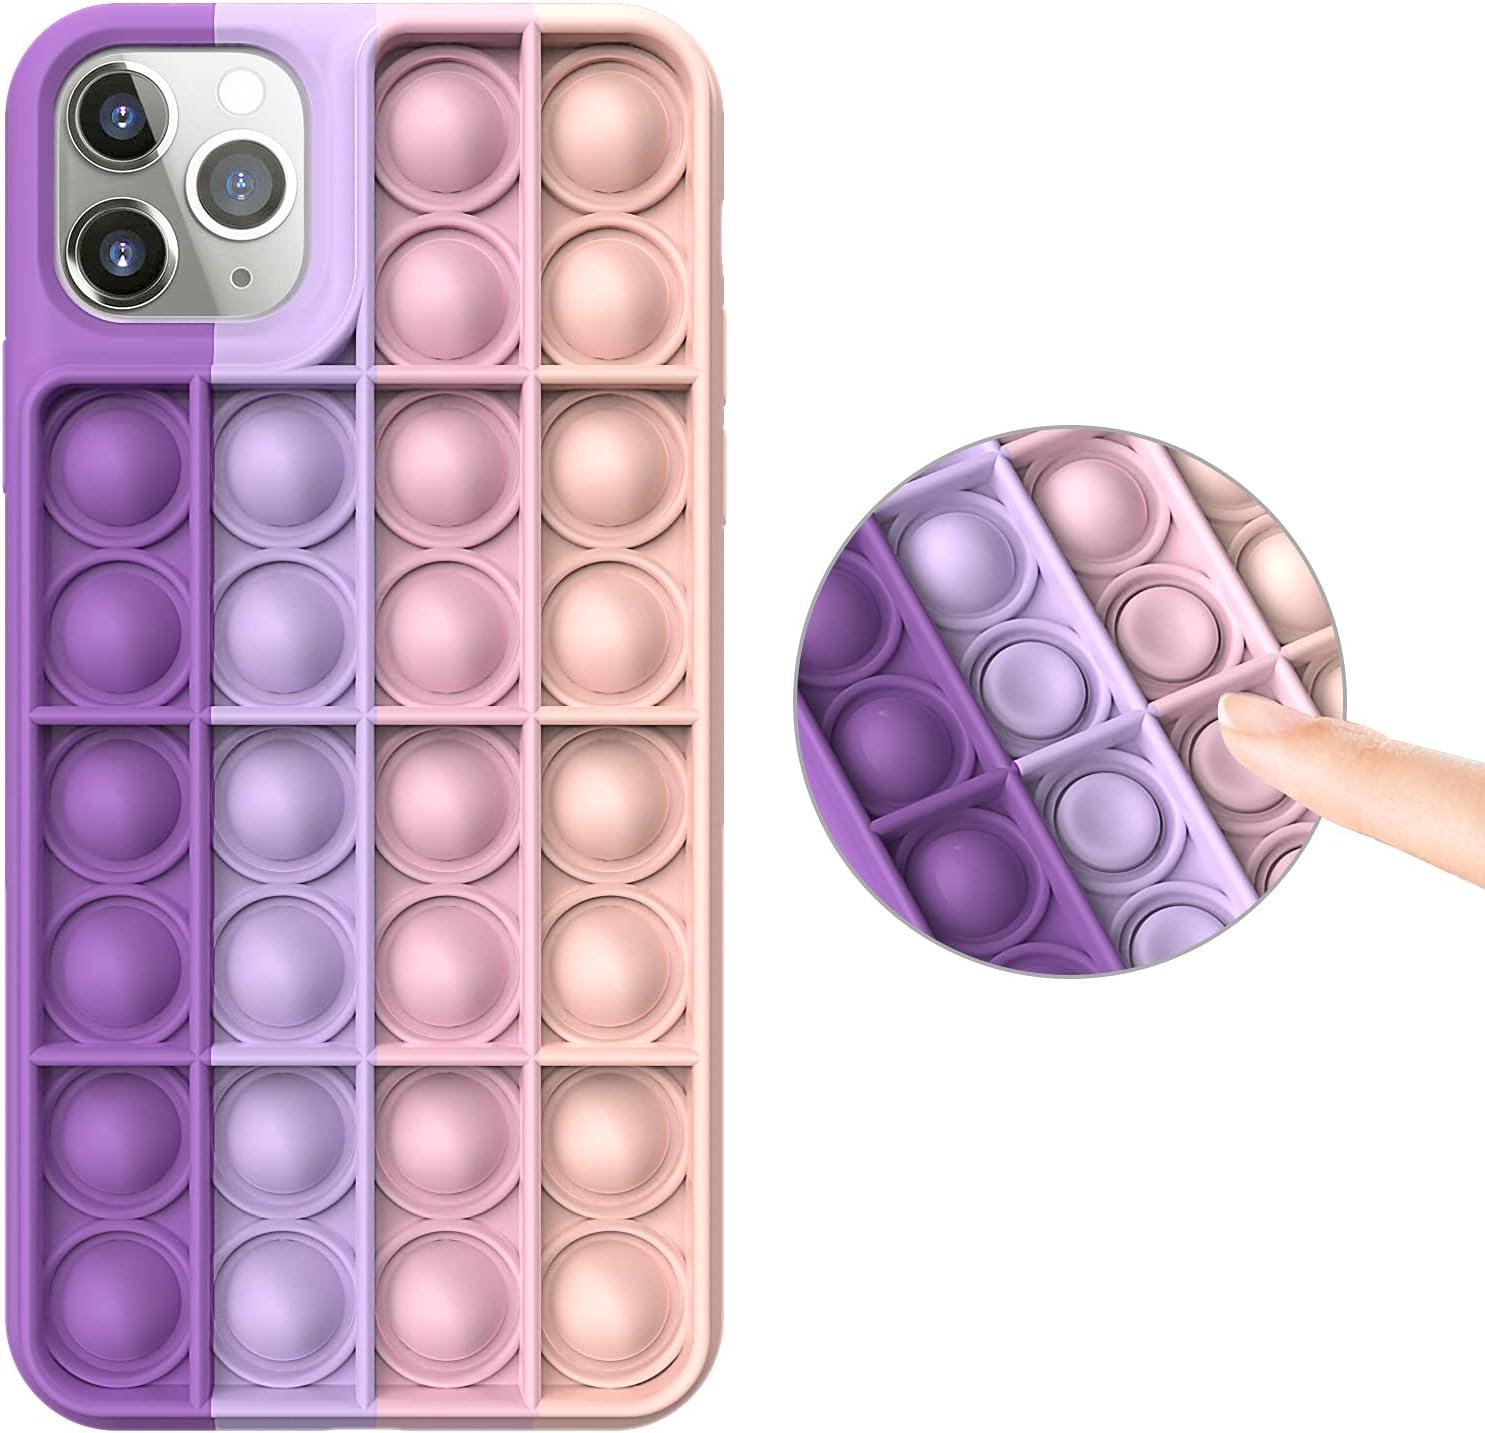 Fidget Toys Case for iPhone 8/7/se2020/8Plus/7Plus/X/XS/XS Max/XR /11 6.1/11 PRO MAX /12/12 Pro/12 Pro Max,Push Bubble Soft Silicone Pop Shockproof Protecive Case for iPhone